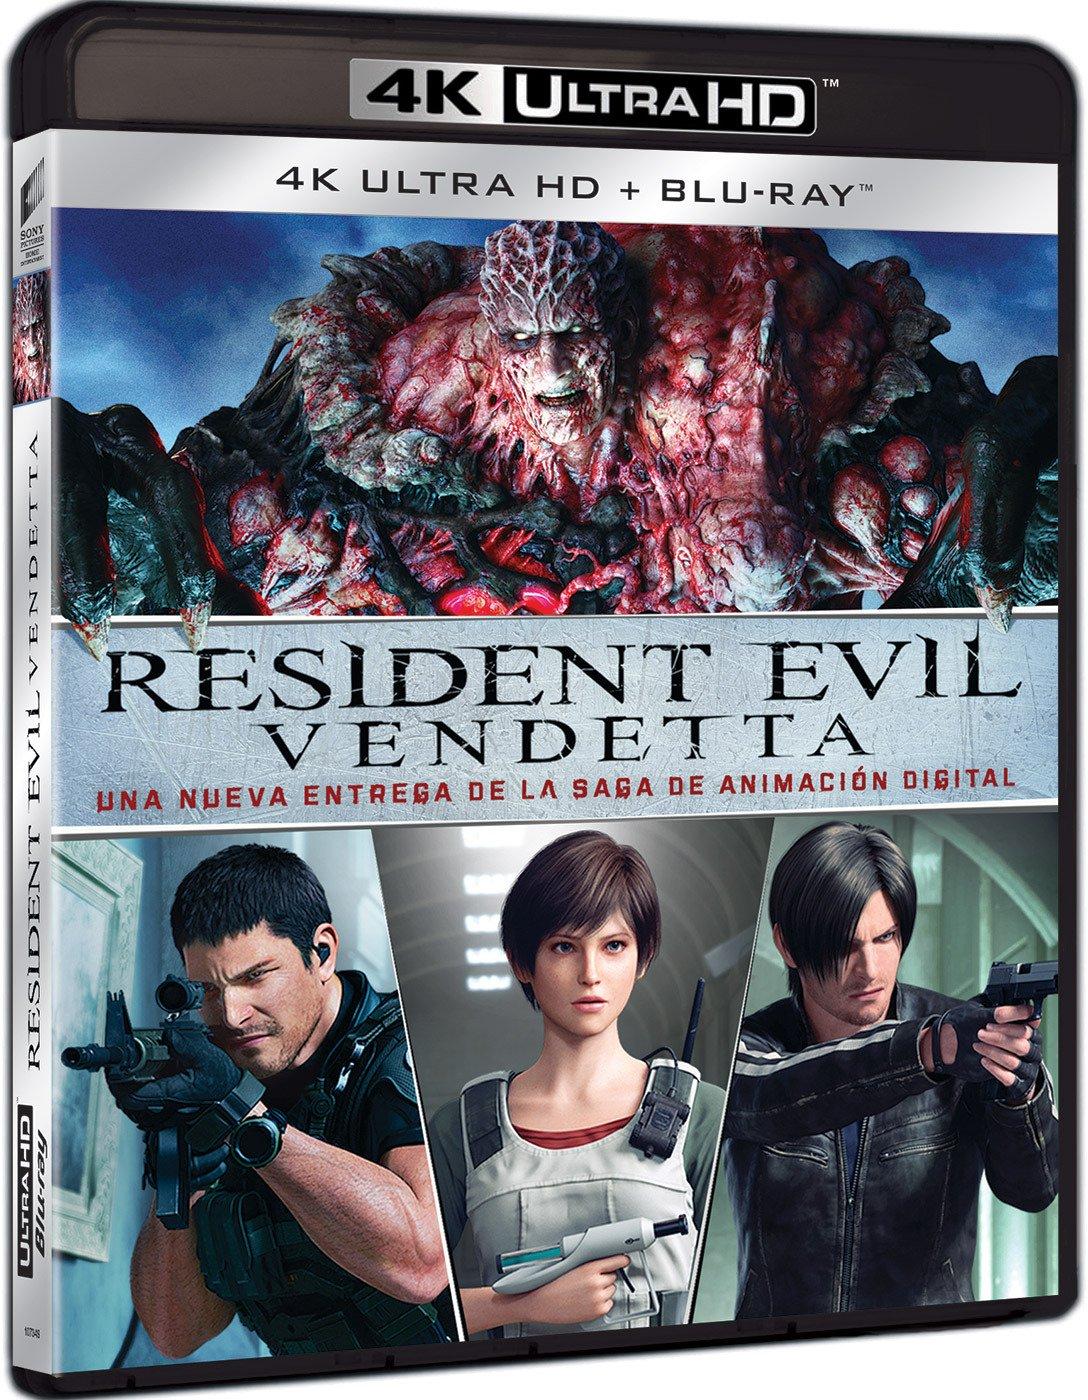 Resident Evil: Vendetta (4K UHD + BD) [Blu-ray]: Amazon.es: Erin Cahill, Kevin Dorman, Arif S. Kinchen, Karen Strassman, Kari Wahlgren, Takanori Tsujimoto, Erin Cahill, Kevin Dorman, Capcom Company, Marza Animation Planet: Cine